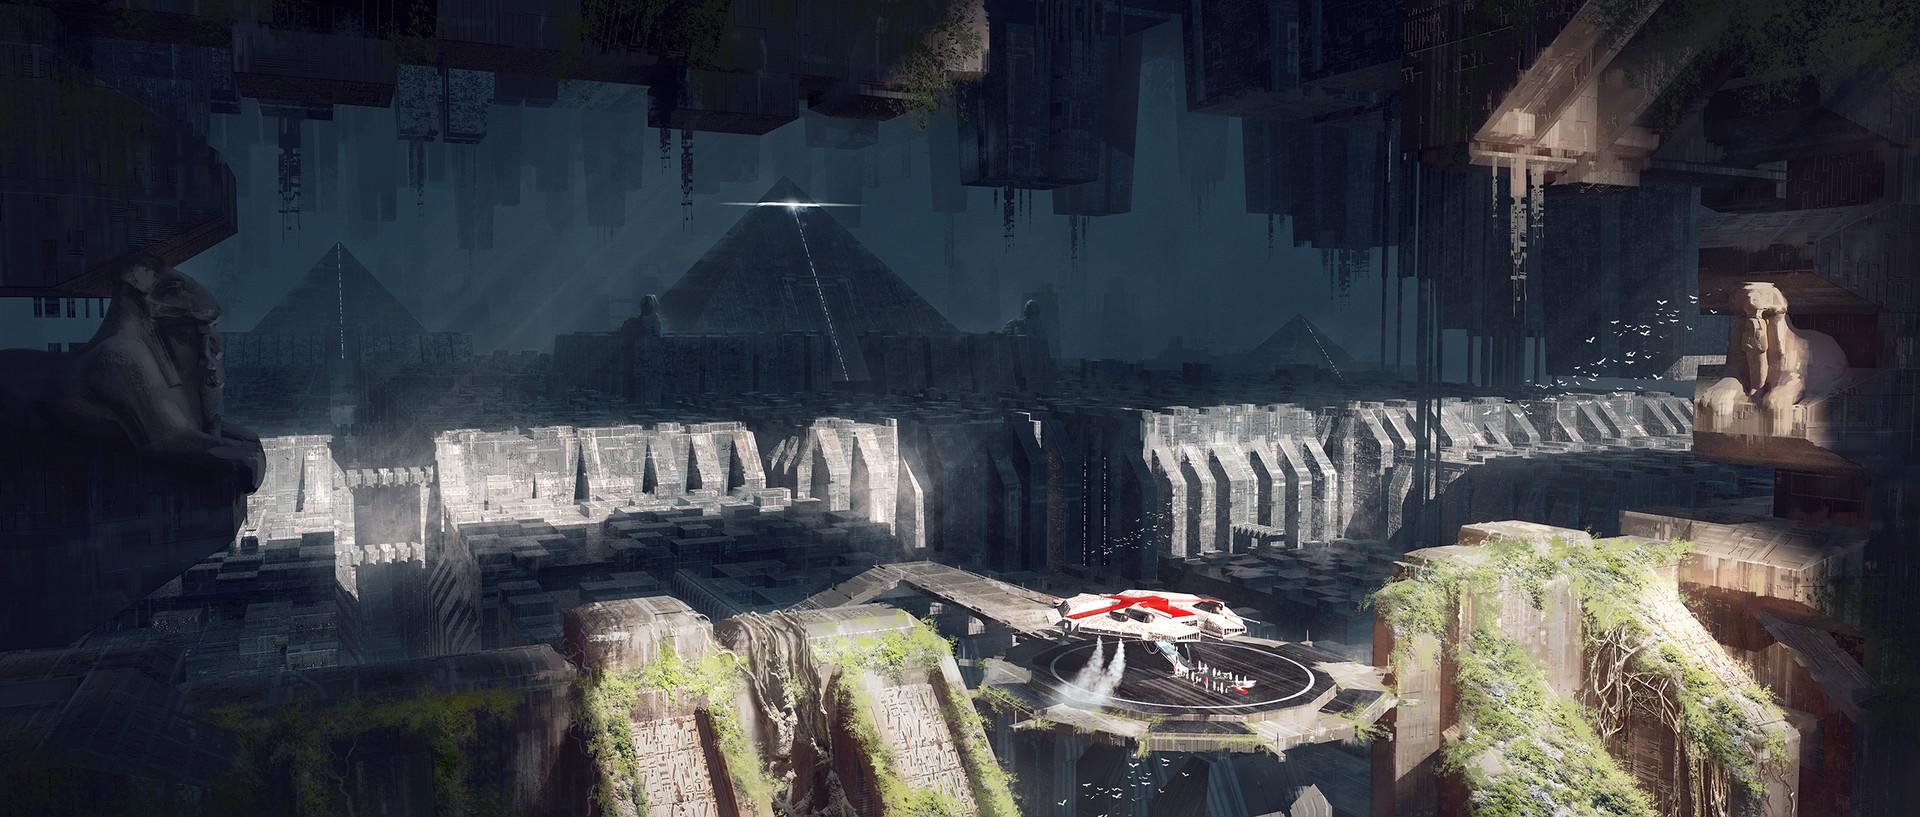 Joakim ericsson necropolis painting3